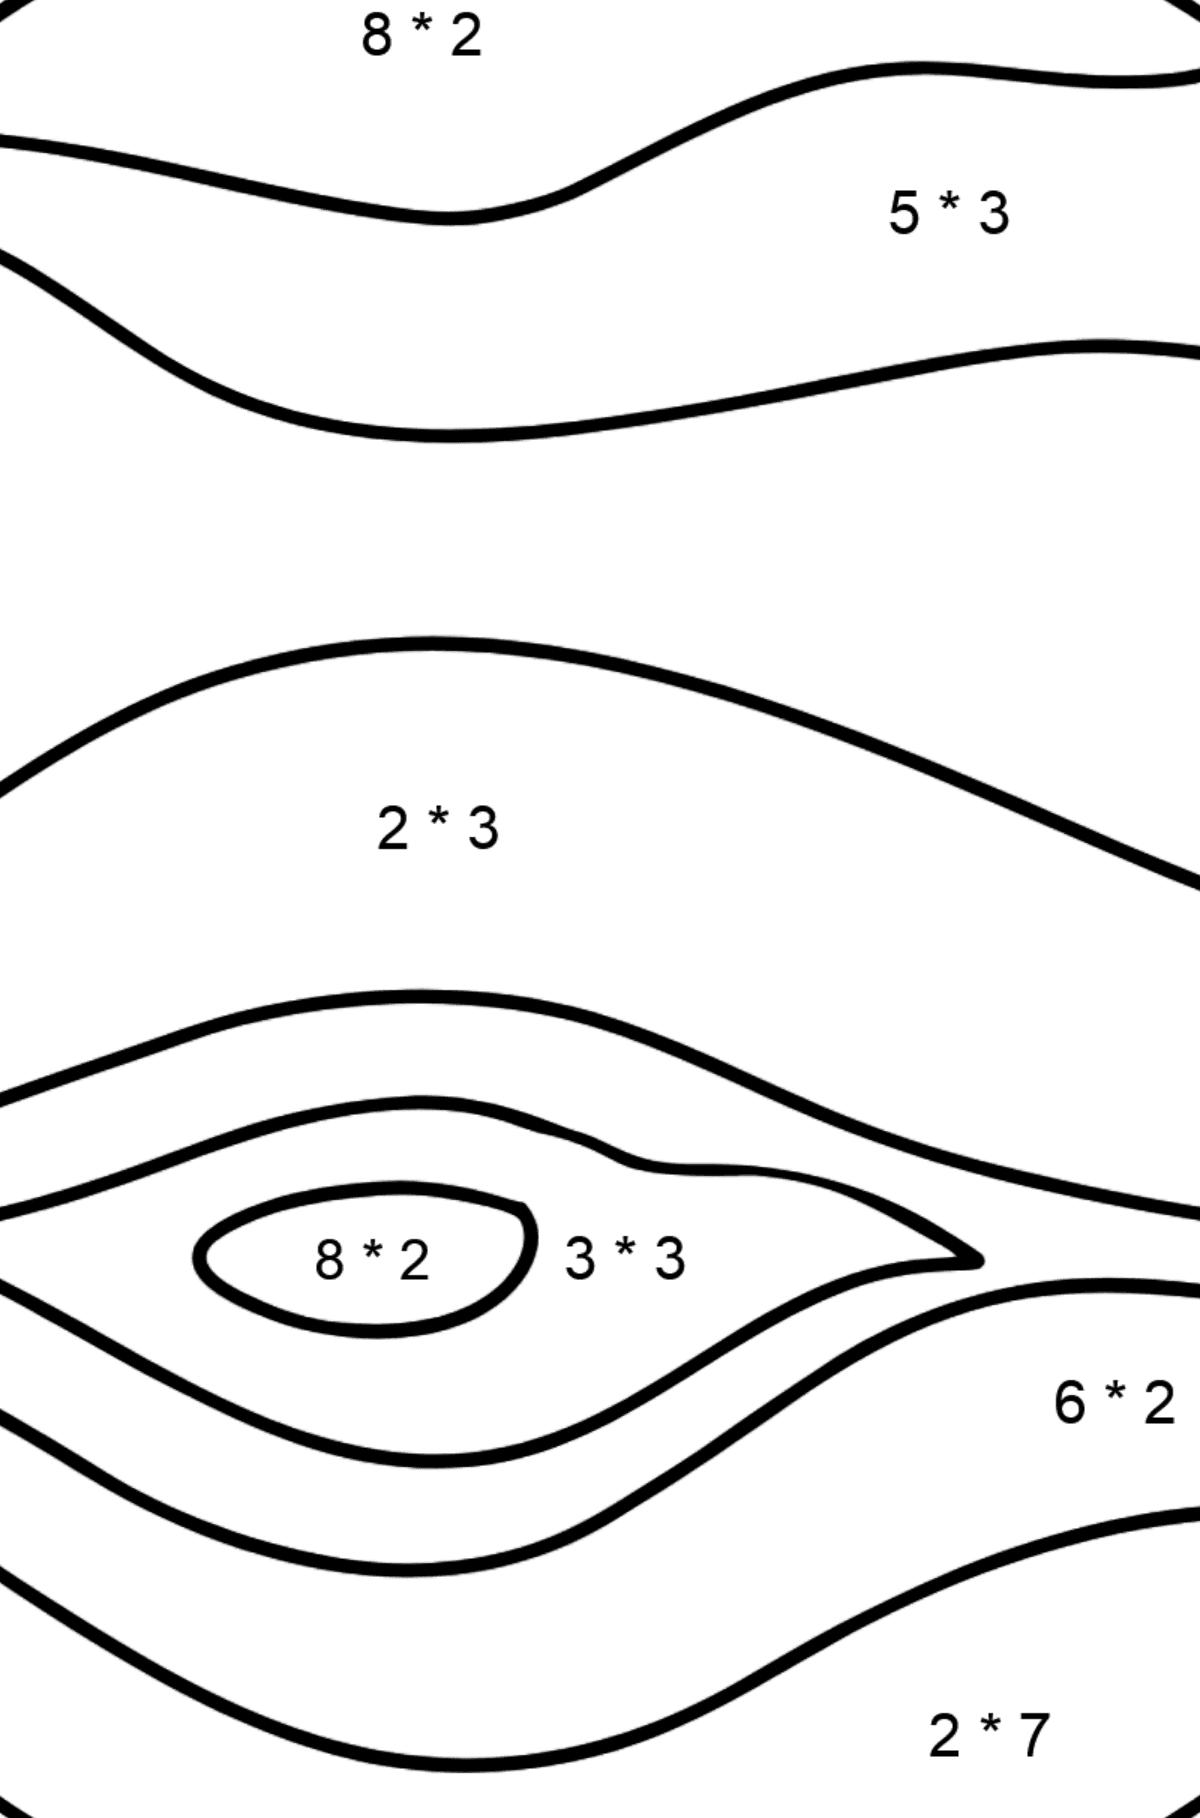 Jupiter coloring page - Math Coloring - Multiplication for Kids